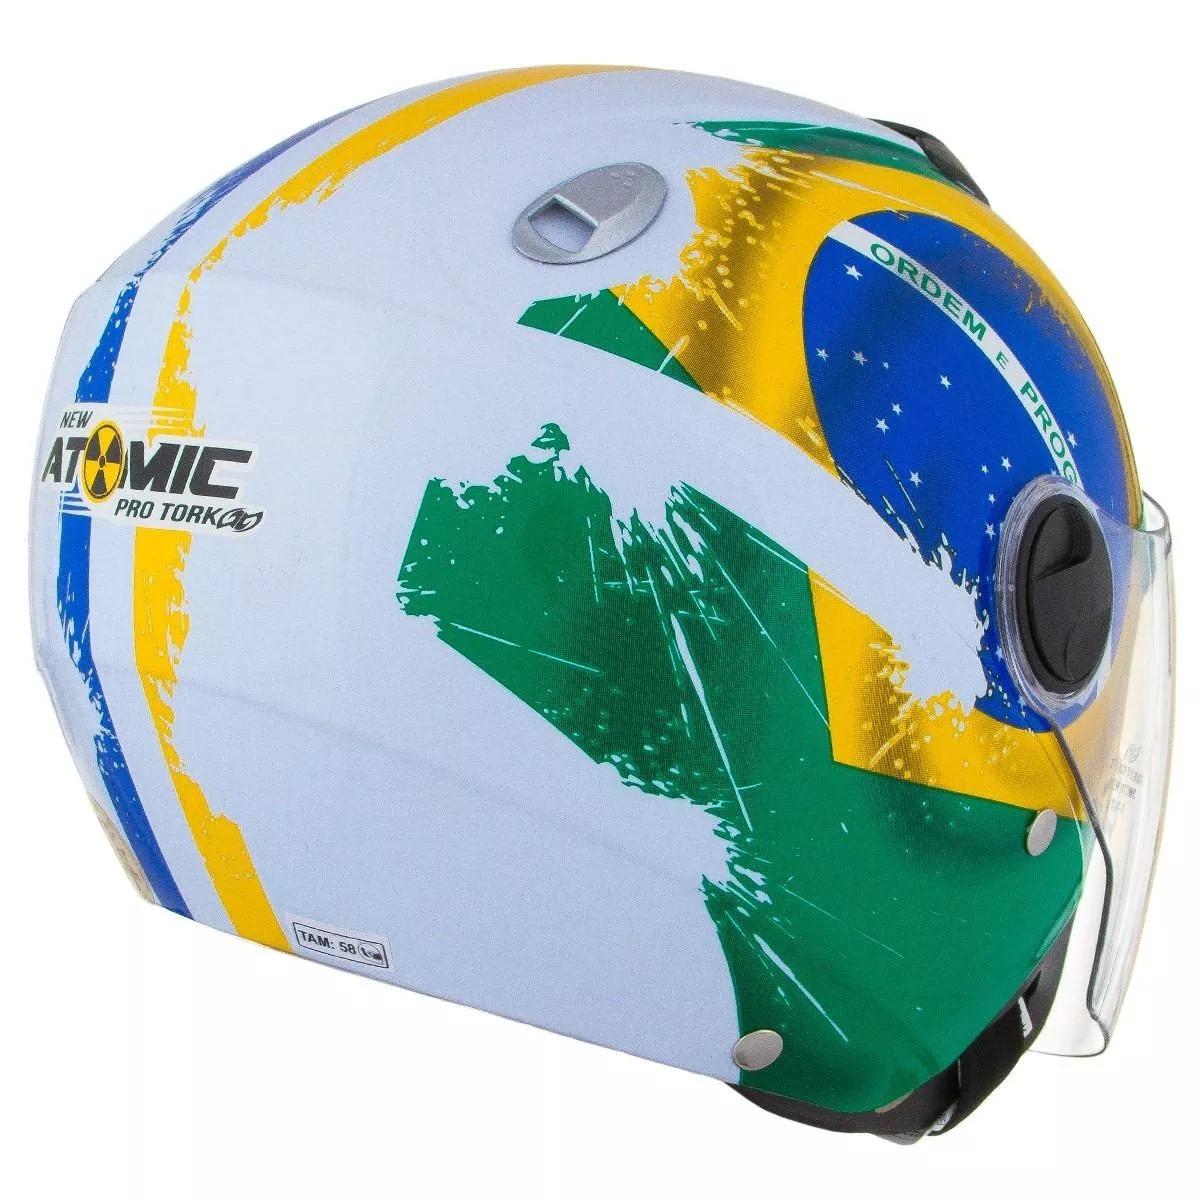 Carregando zoom... capacete de moto pro tork new atomic bandeira do brasil f26726fd1bd